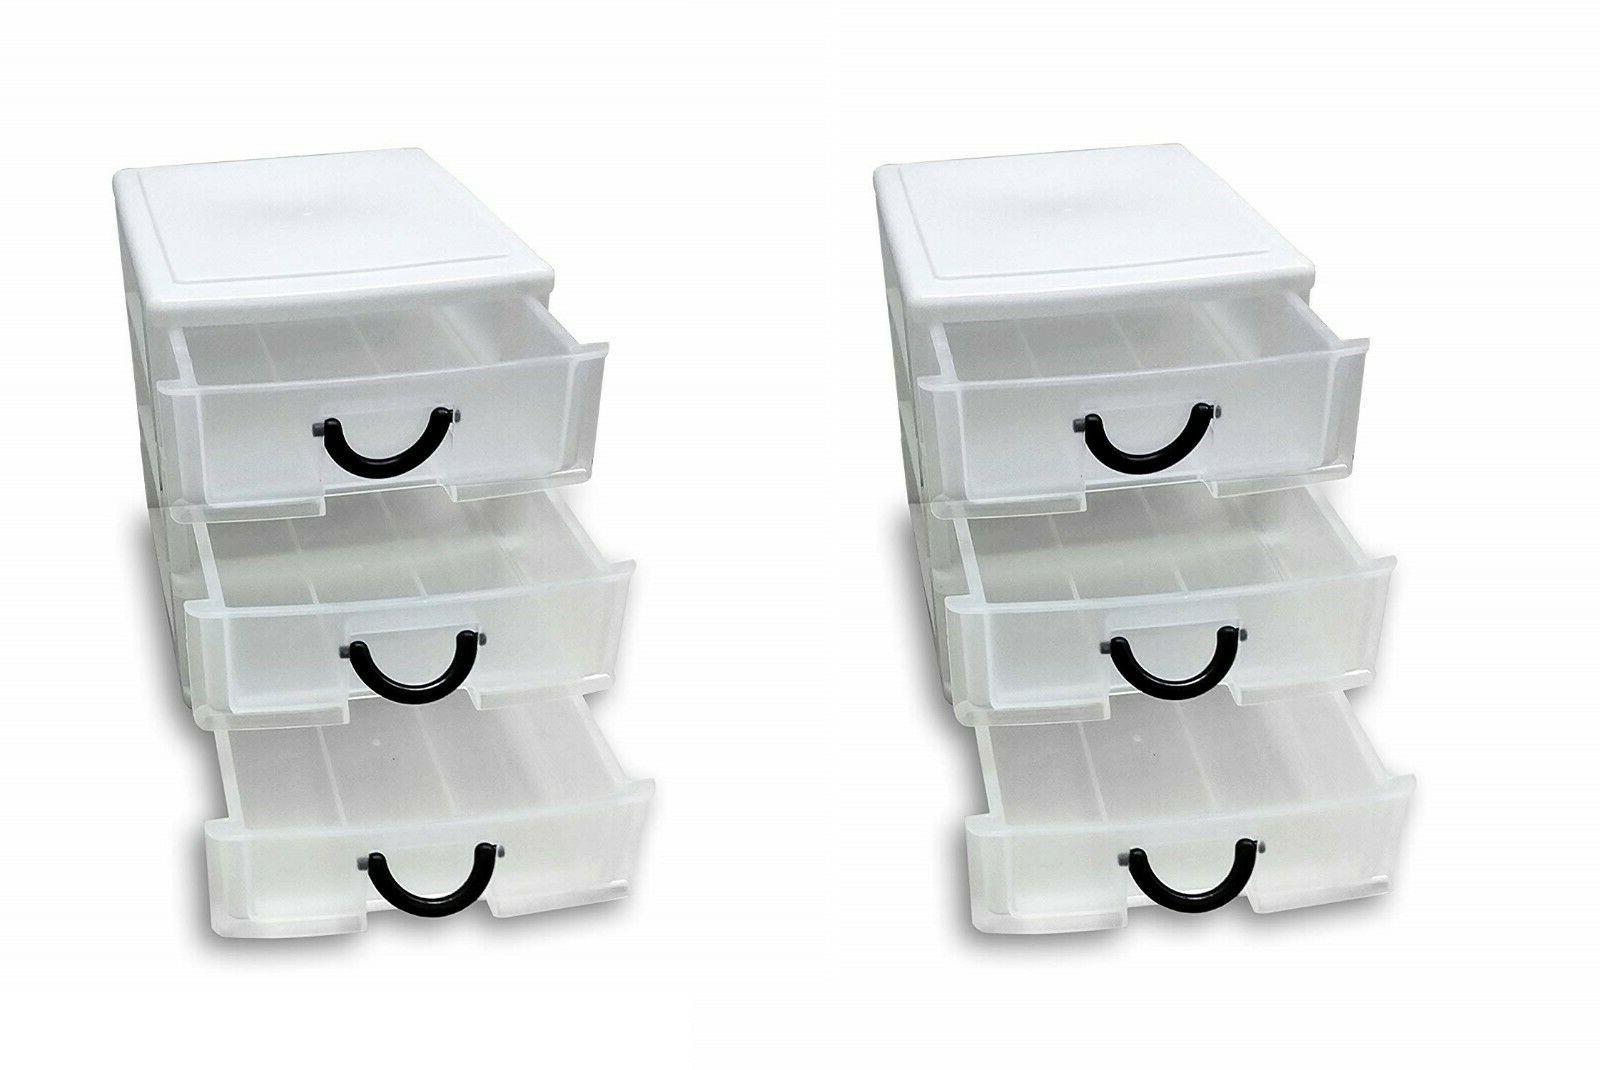 3 drawer tower plastic organizer set of